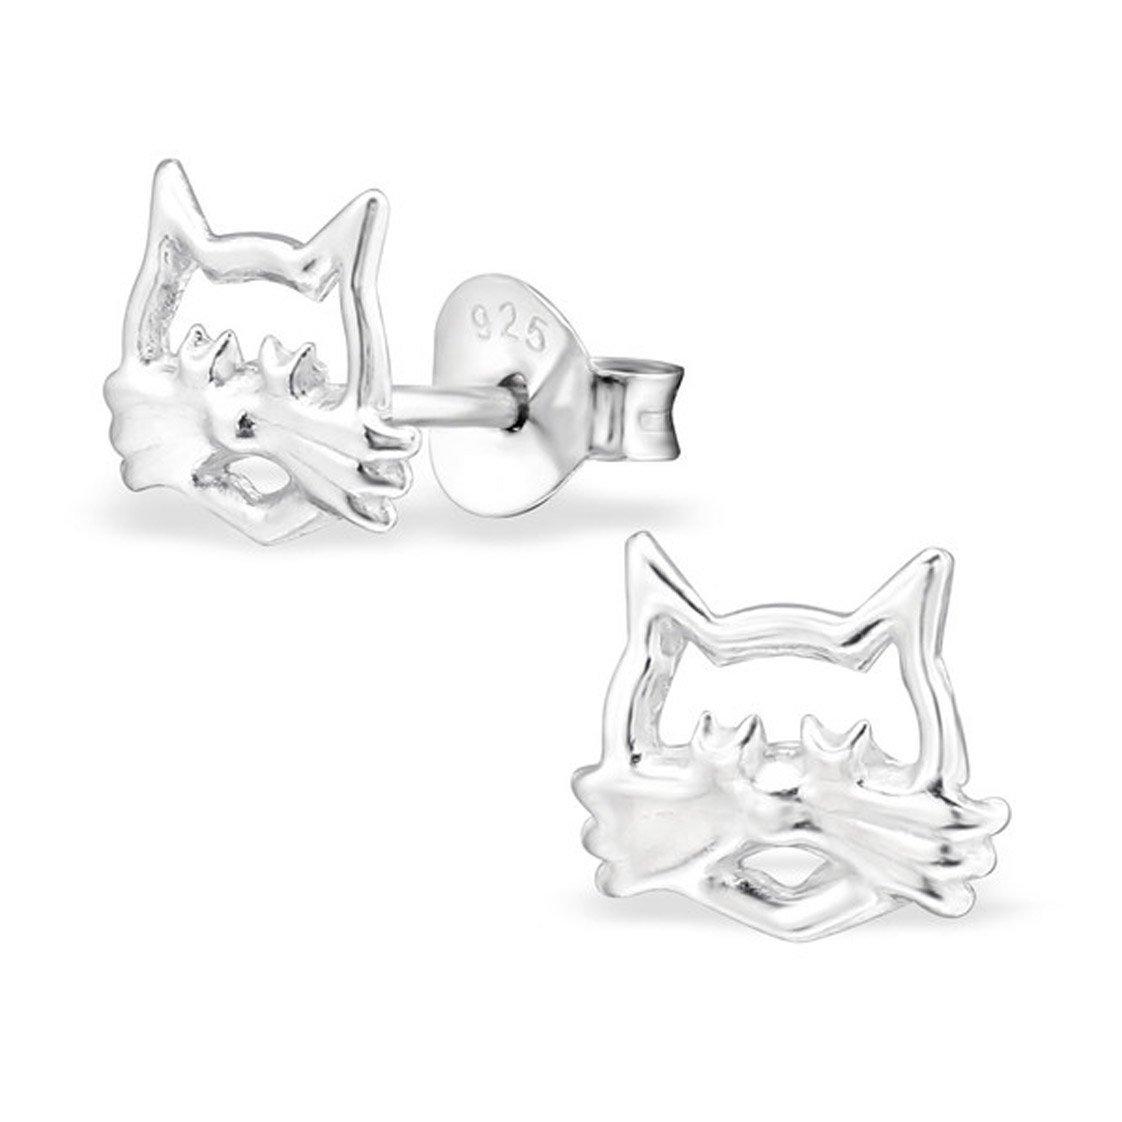 Cute Plain Silver Cat Earrings Studs Girls Children Cut out Stering Silver 925